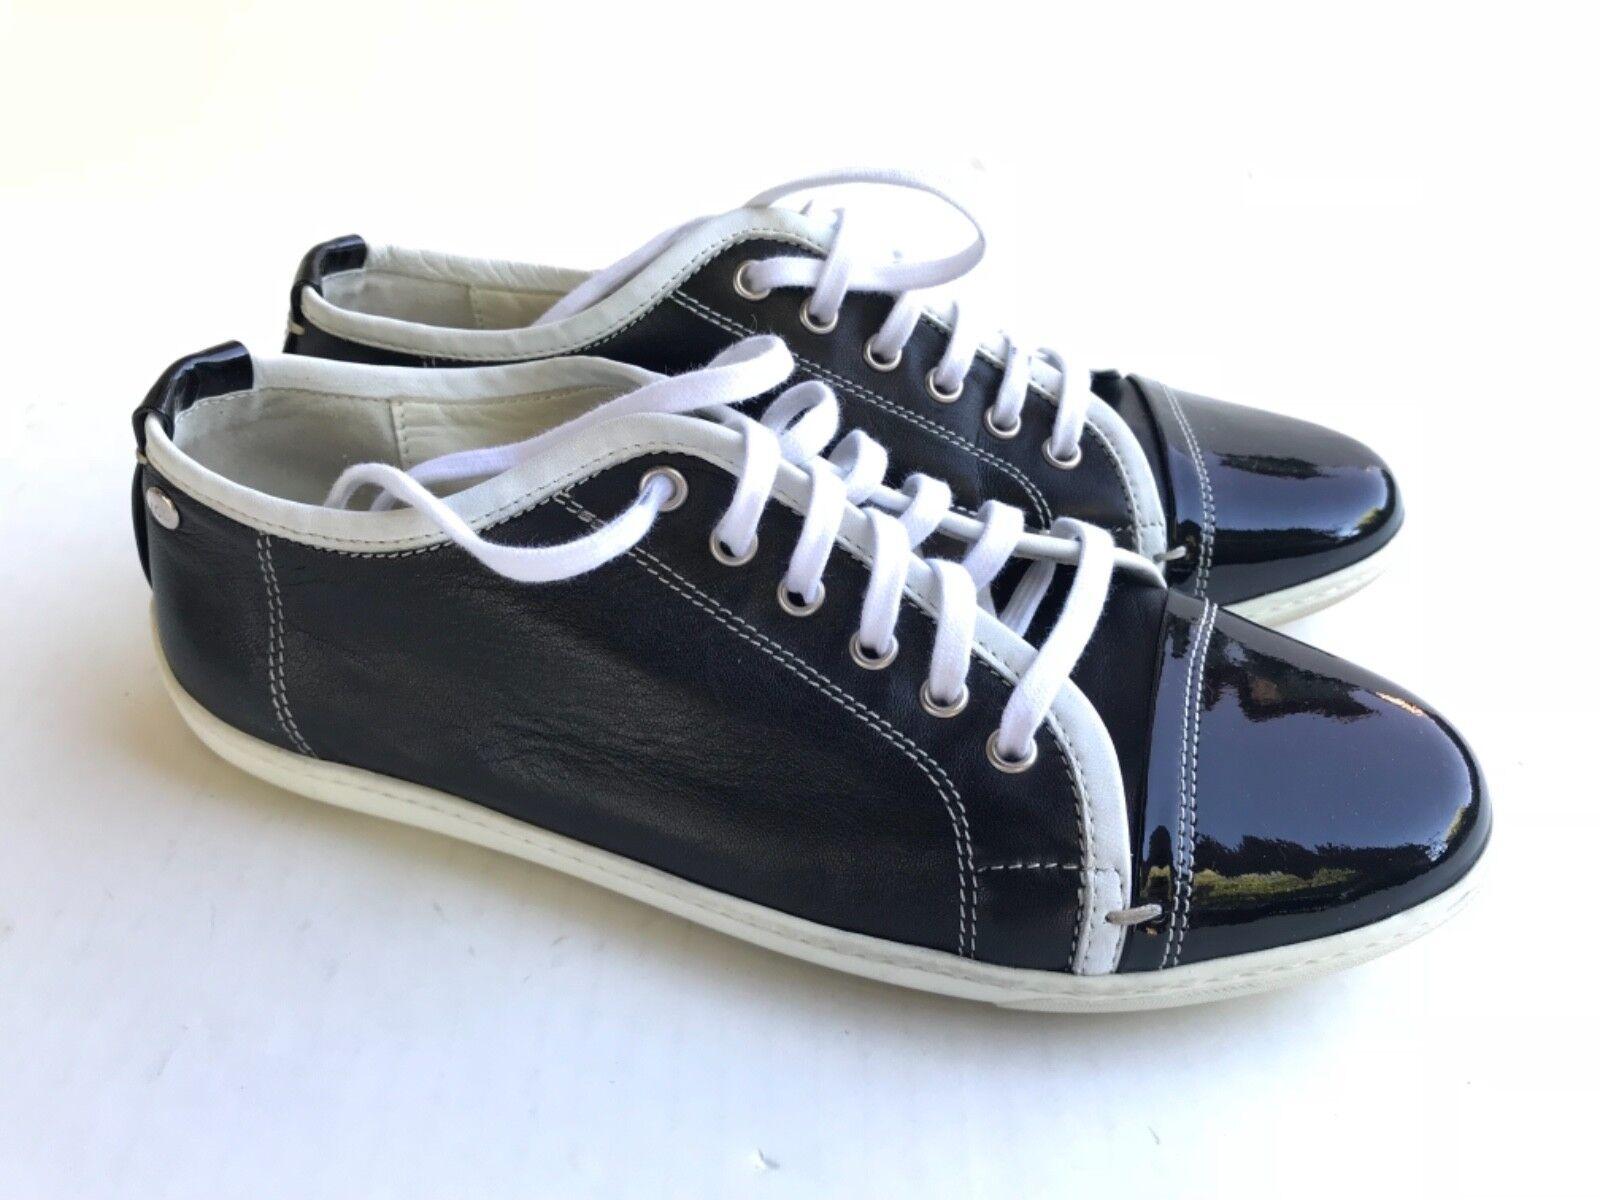 AGL Attilio Giusti Leombruni  Patent Leather Oxford FlatsLace Sneaker shoes